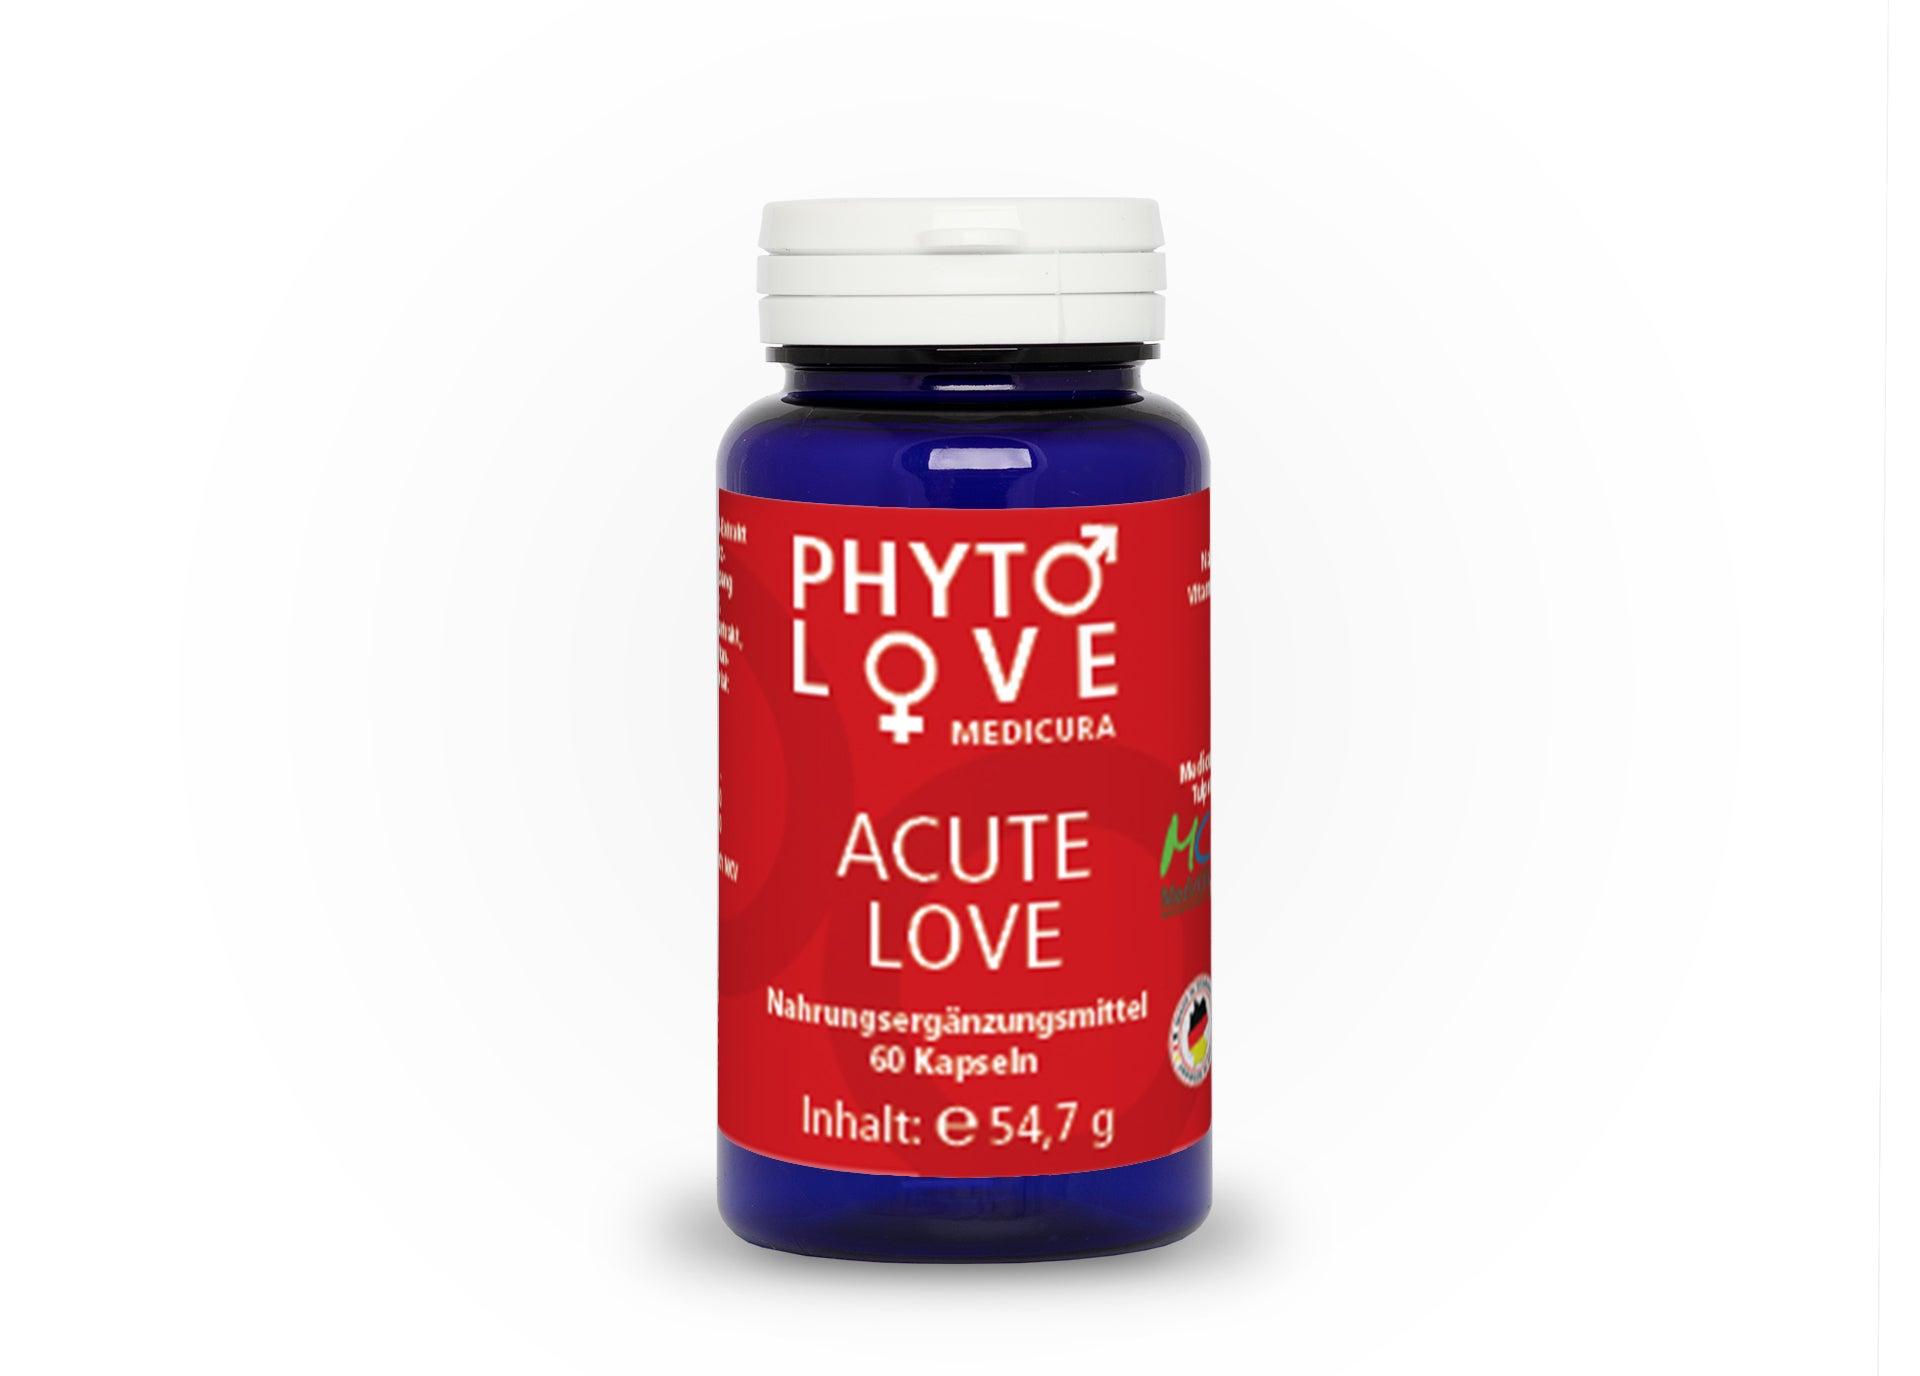 Phyto Love - Acute Love - 60 Kapseln